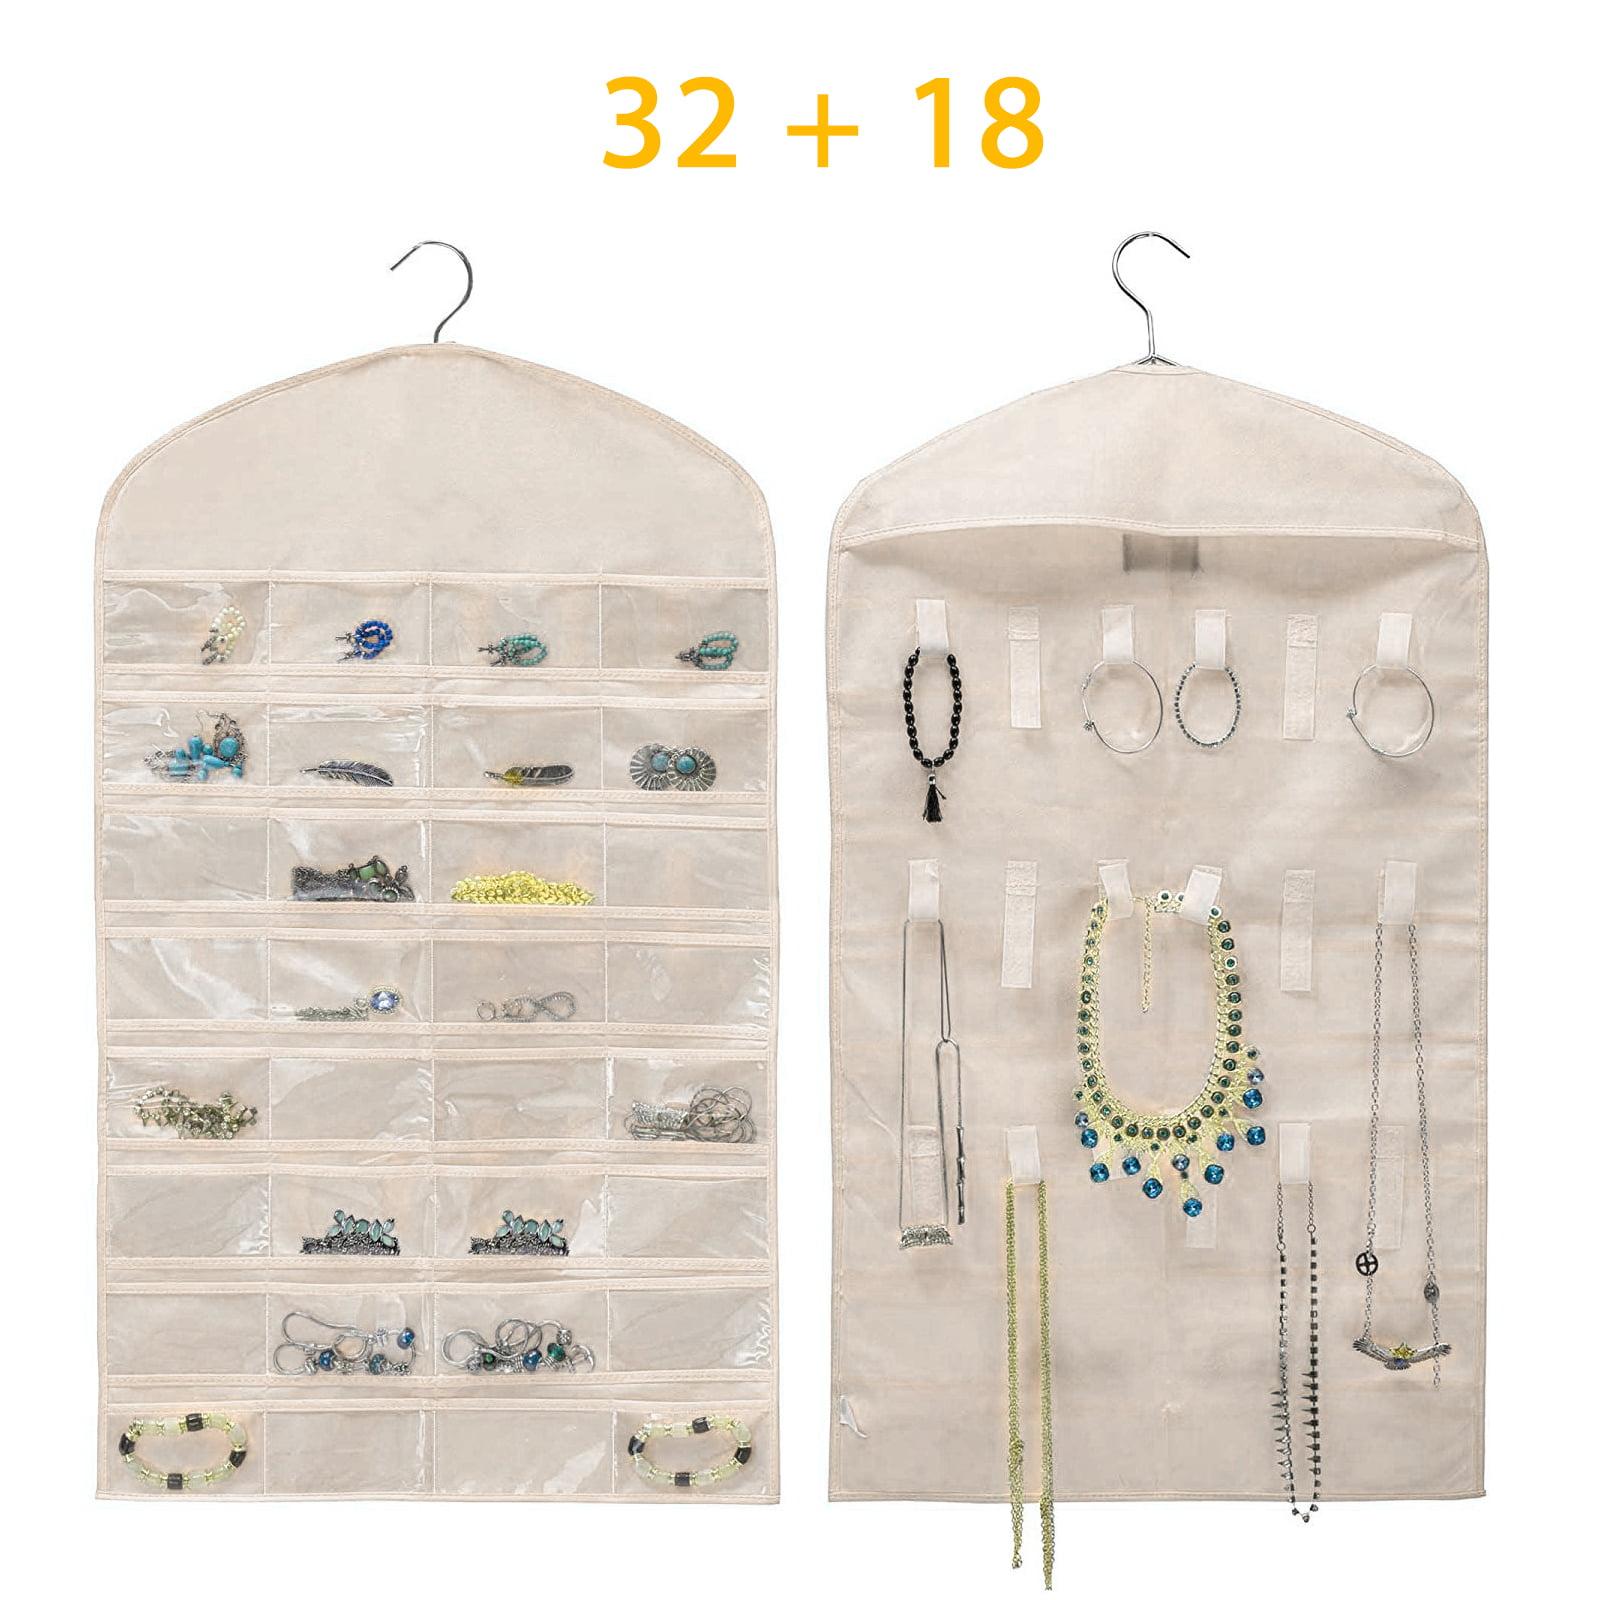 Eeekit Closet Hanging Jewelry Organizer Necklace Storage Holder Travel Display Case Bag